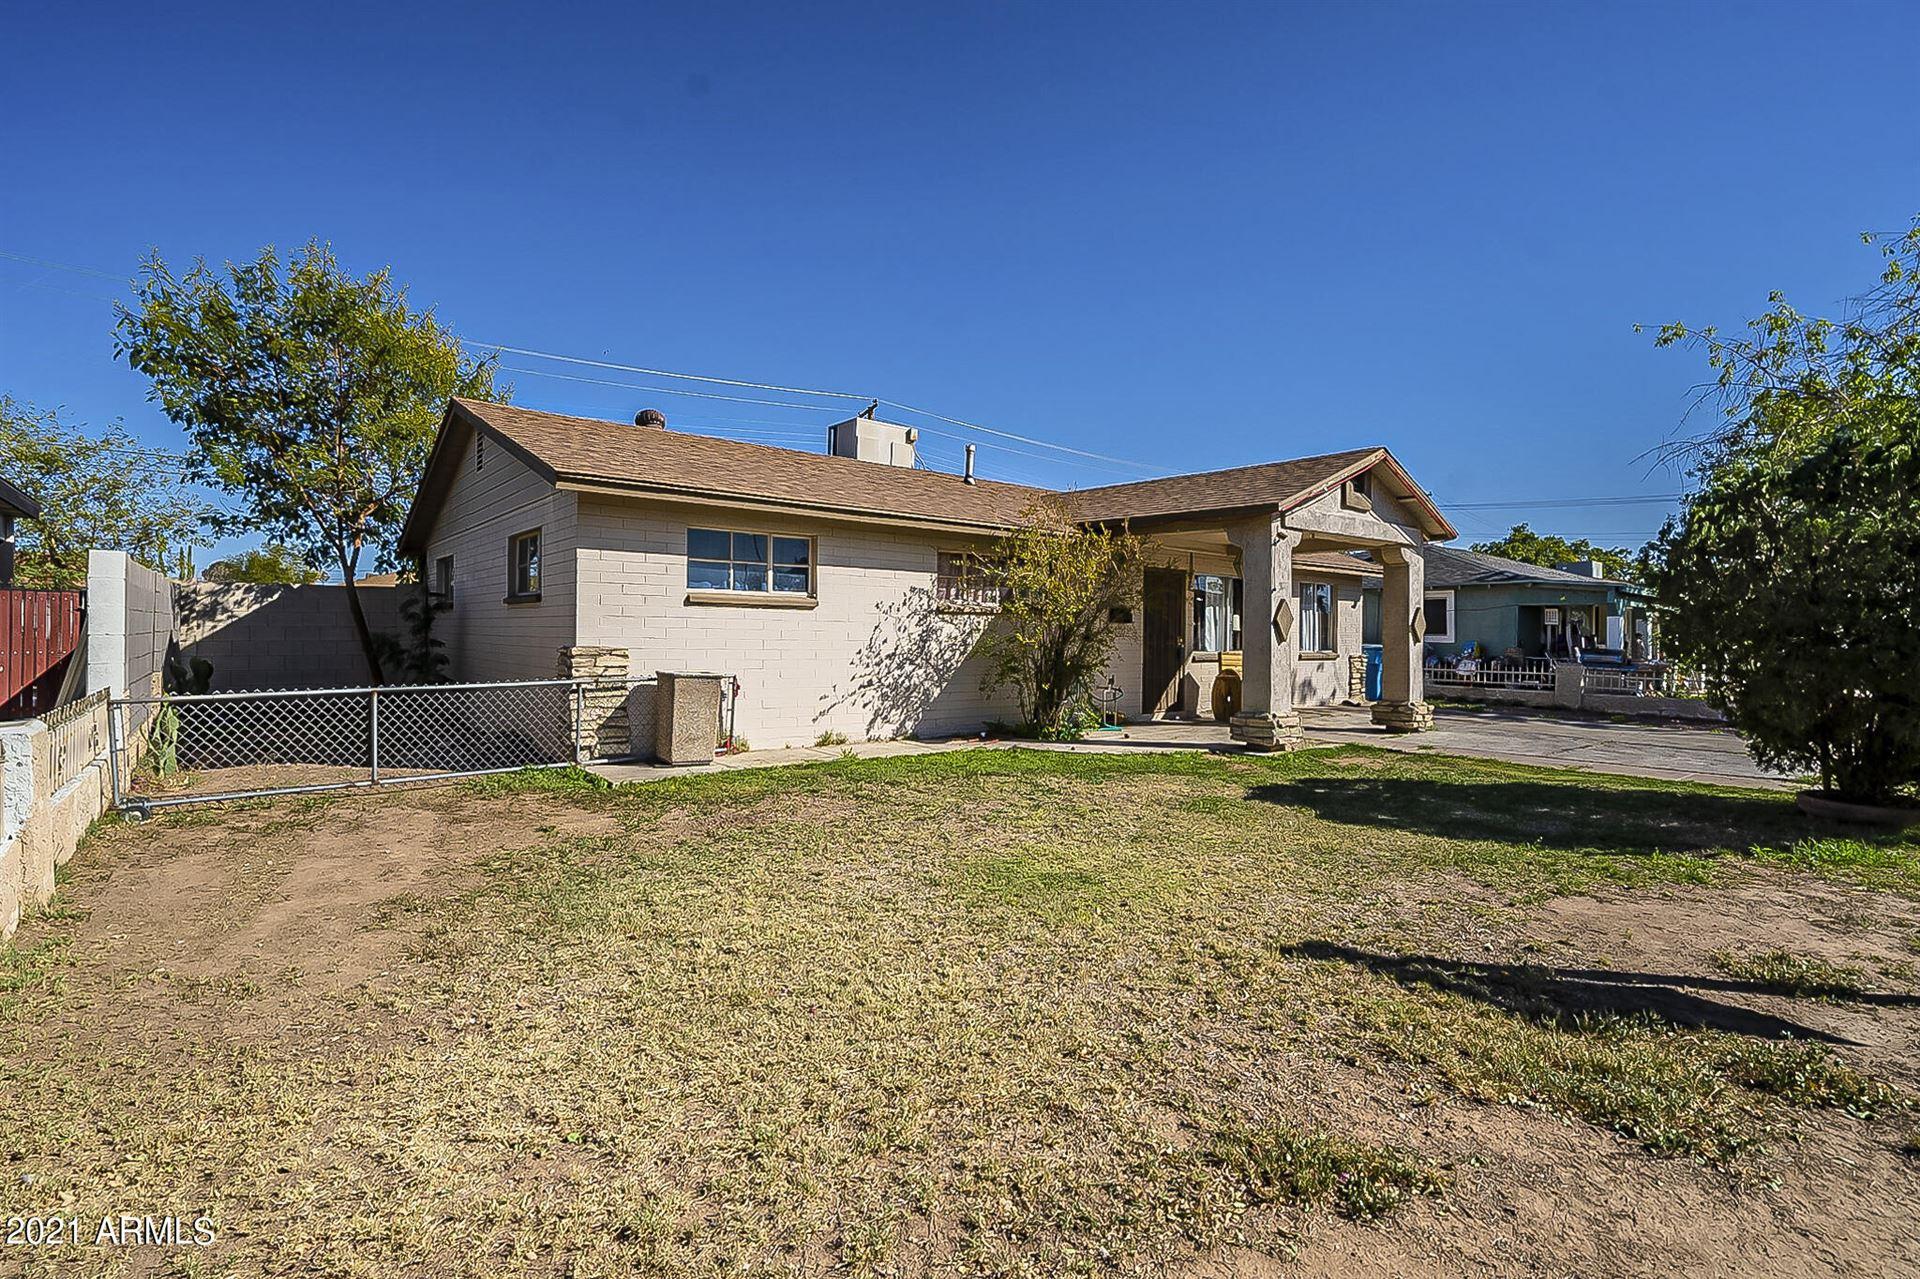 2533 N 41ST Avenue, Phoenix, AZ 85009 - MLS#: 6202120